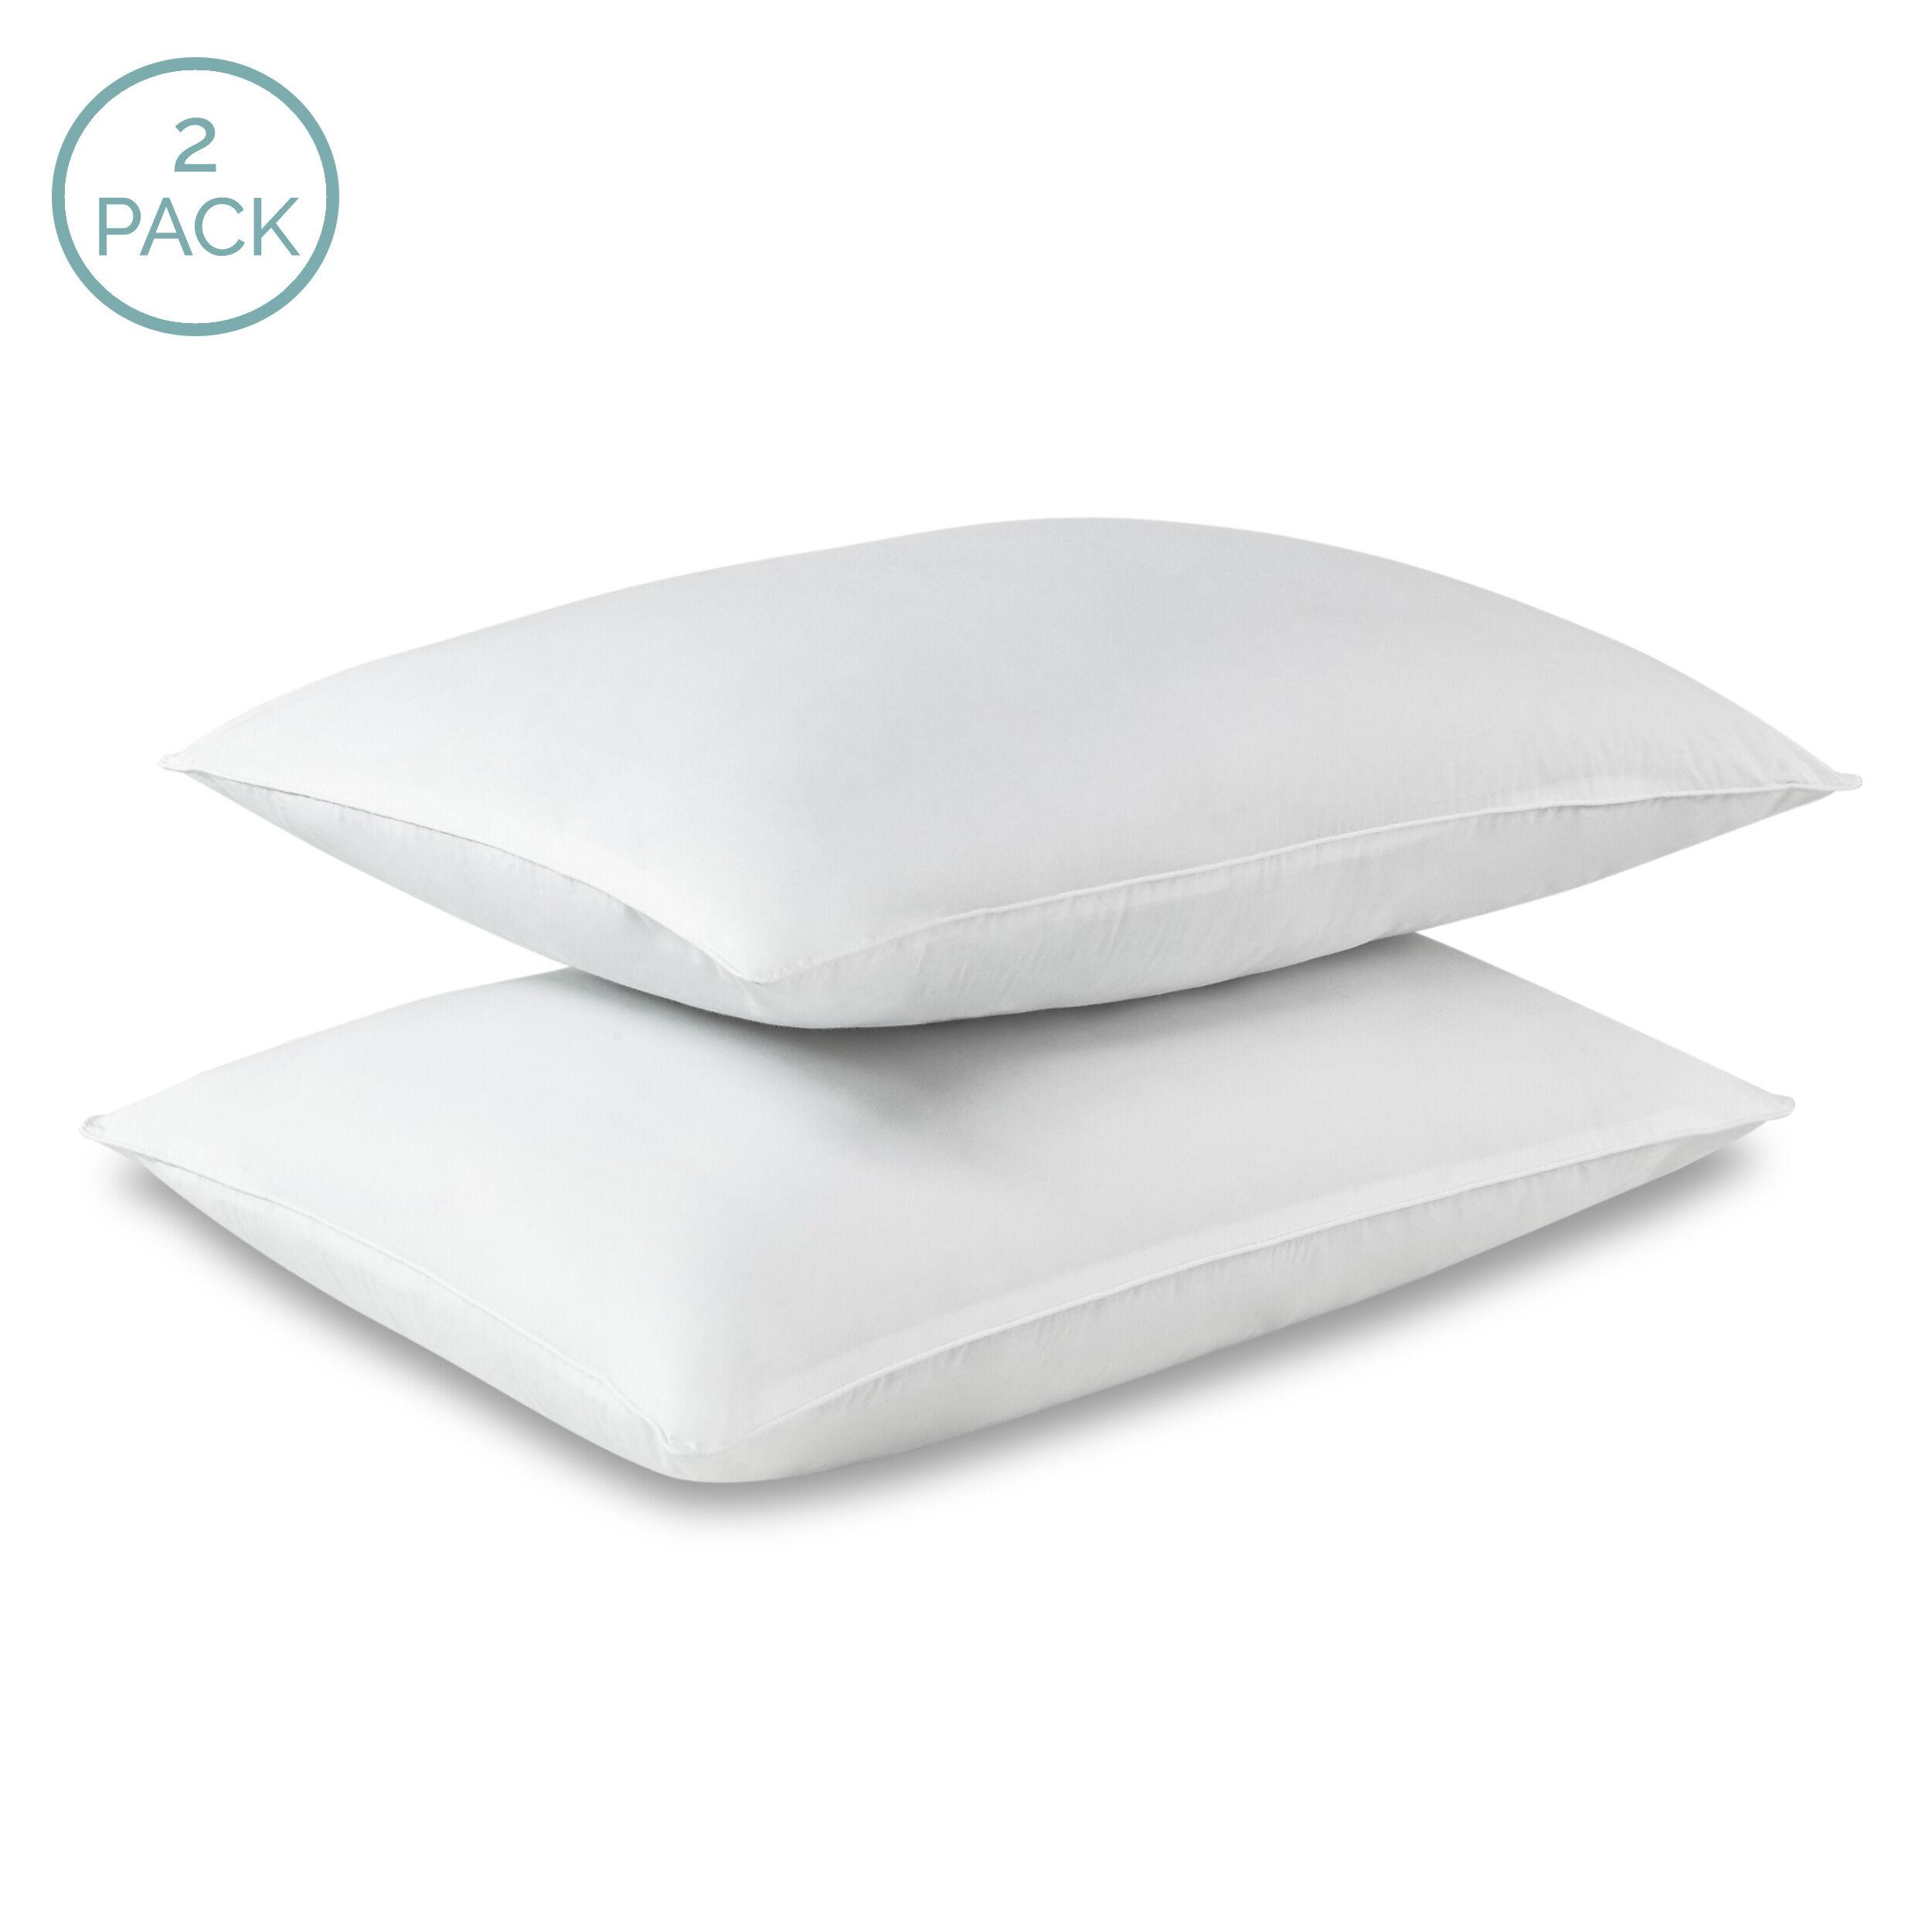 beautyrest cooling pillow 2 pack